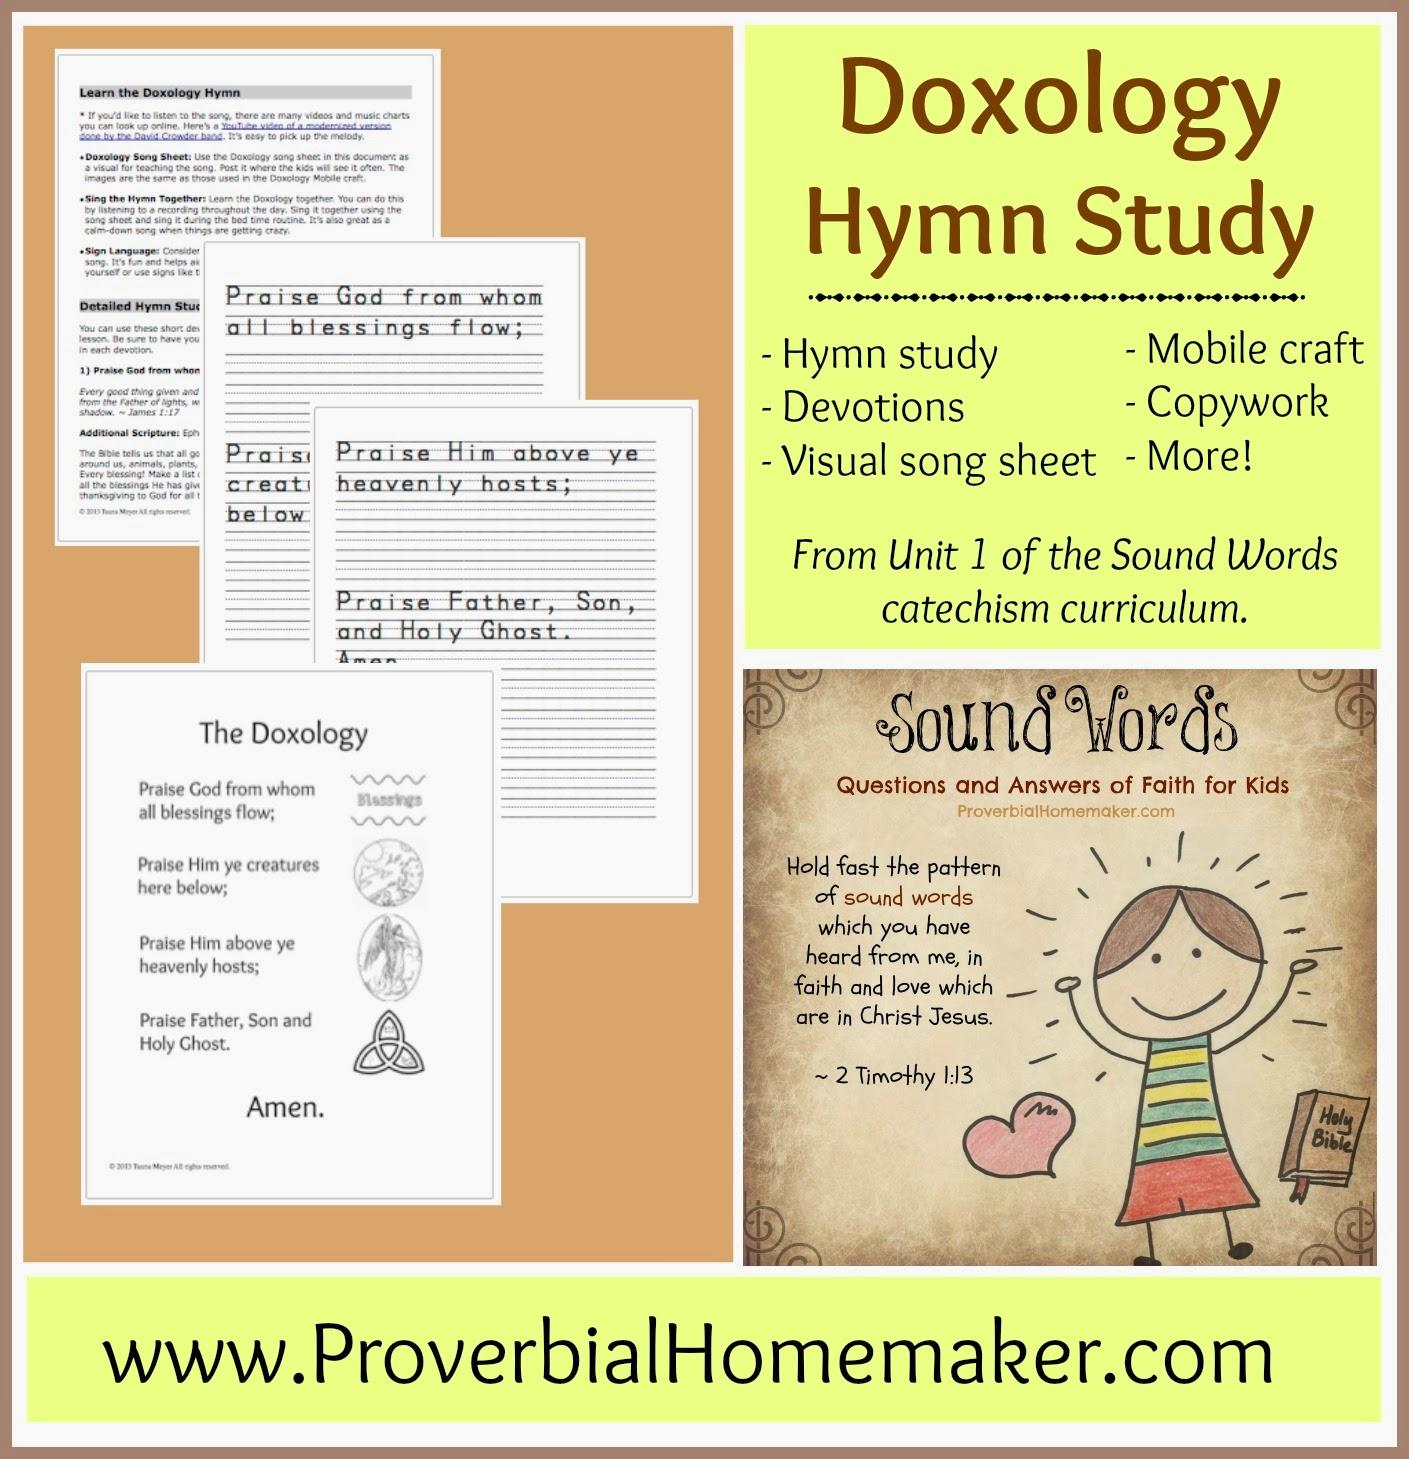 DoxologyStudy